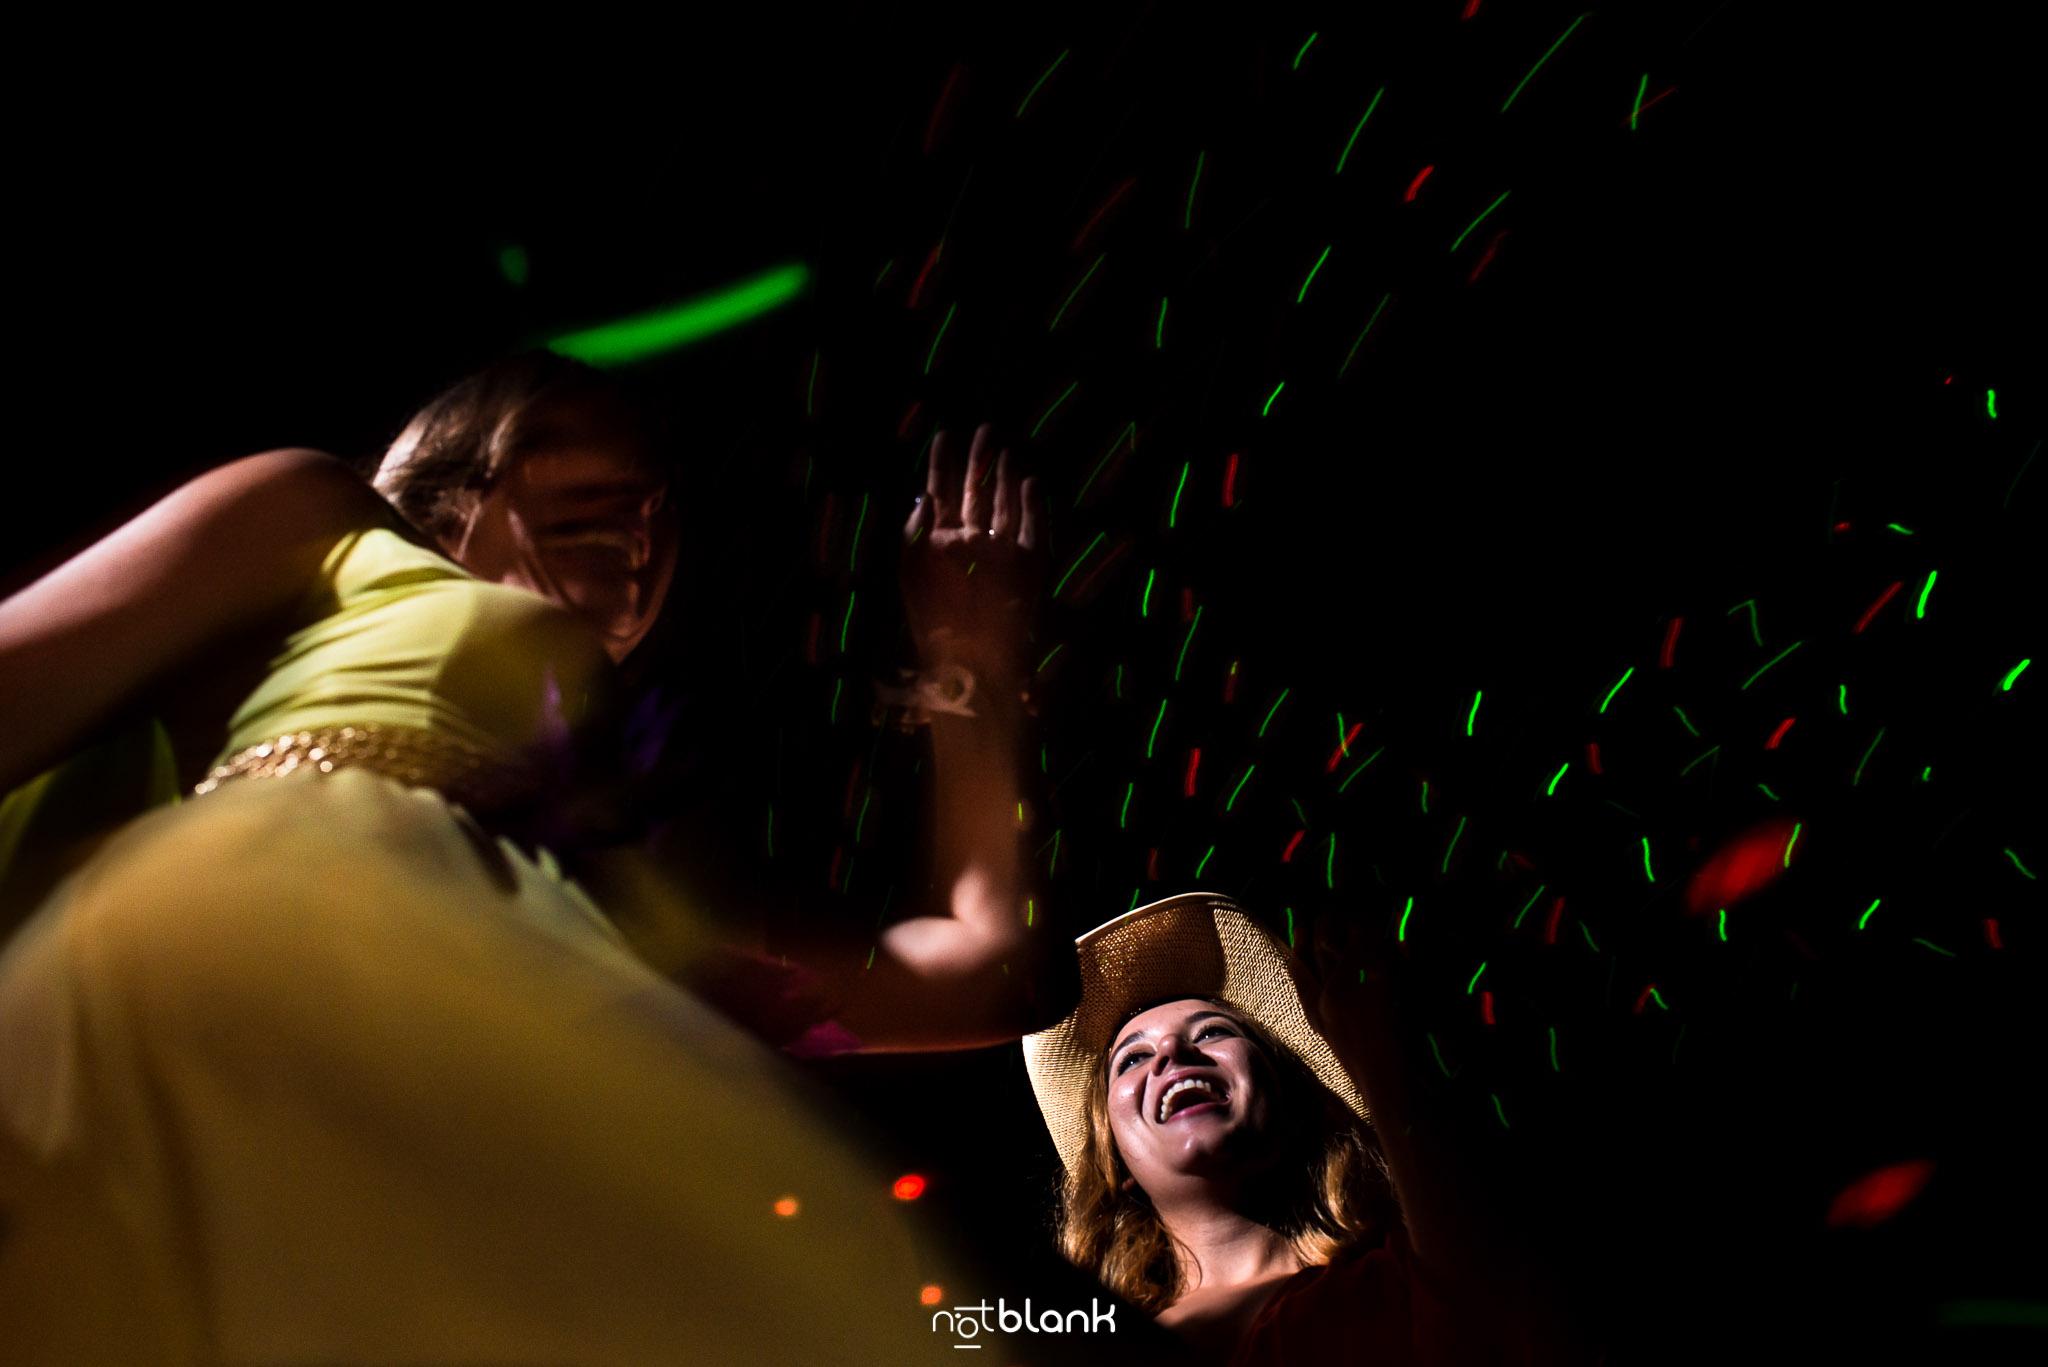 notblank-boda-Fotógrafo de boda-Malaposta-Portugal-Fiesta-Boda Temática-Baile-Amigas